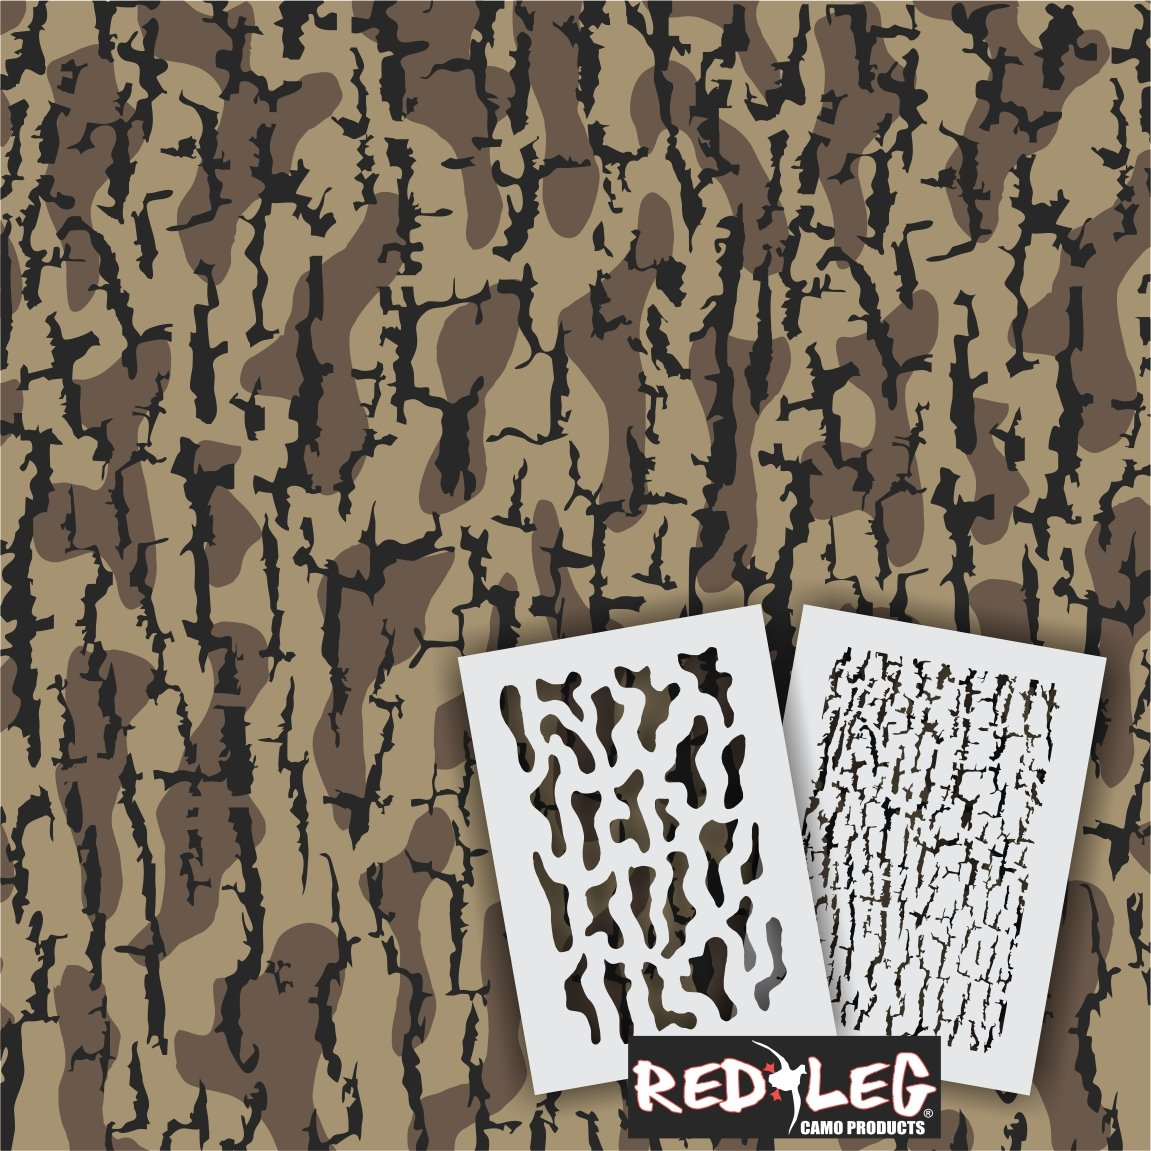 Redleg Camo THD Timber HD camouflage stencil kit